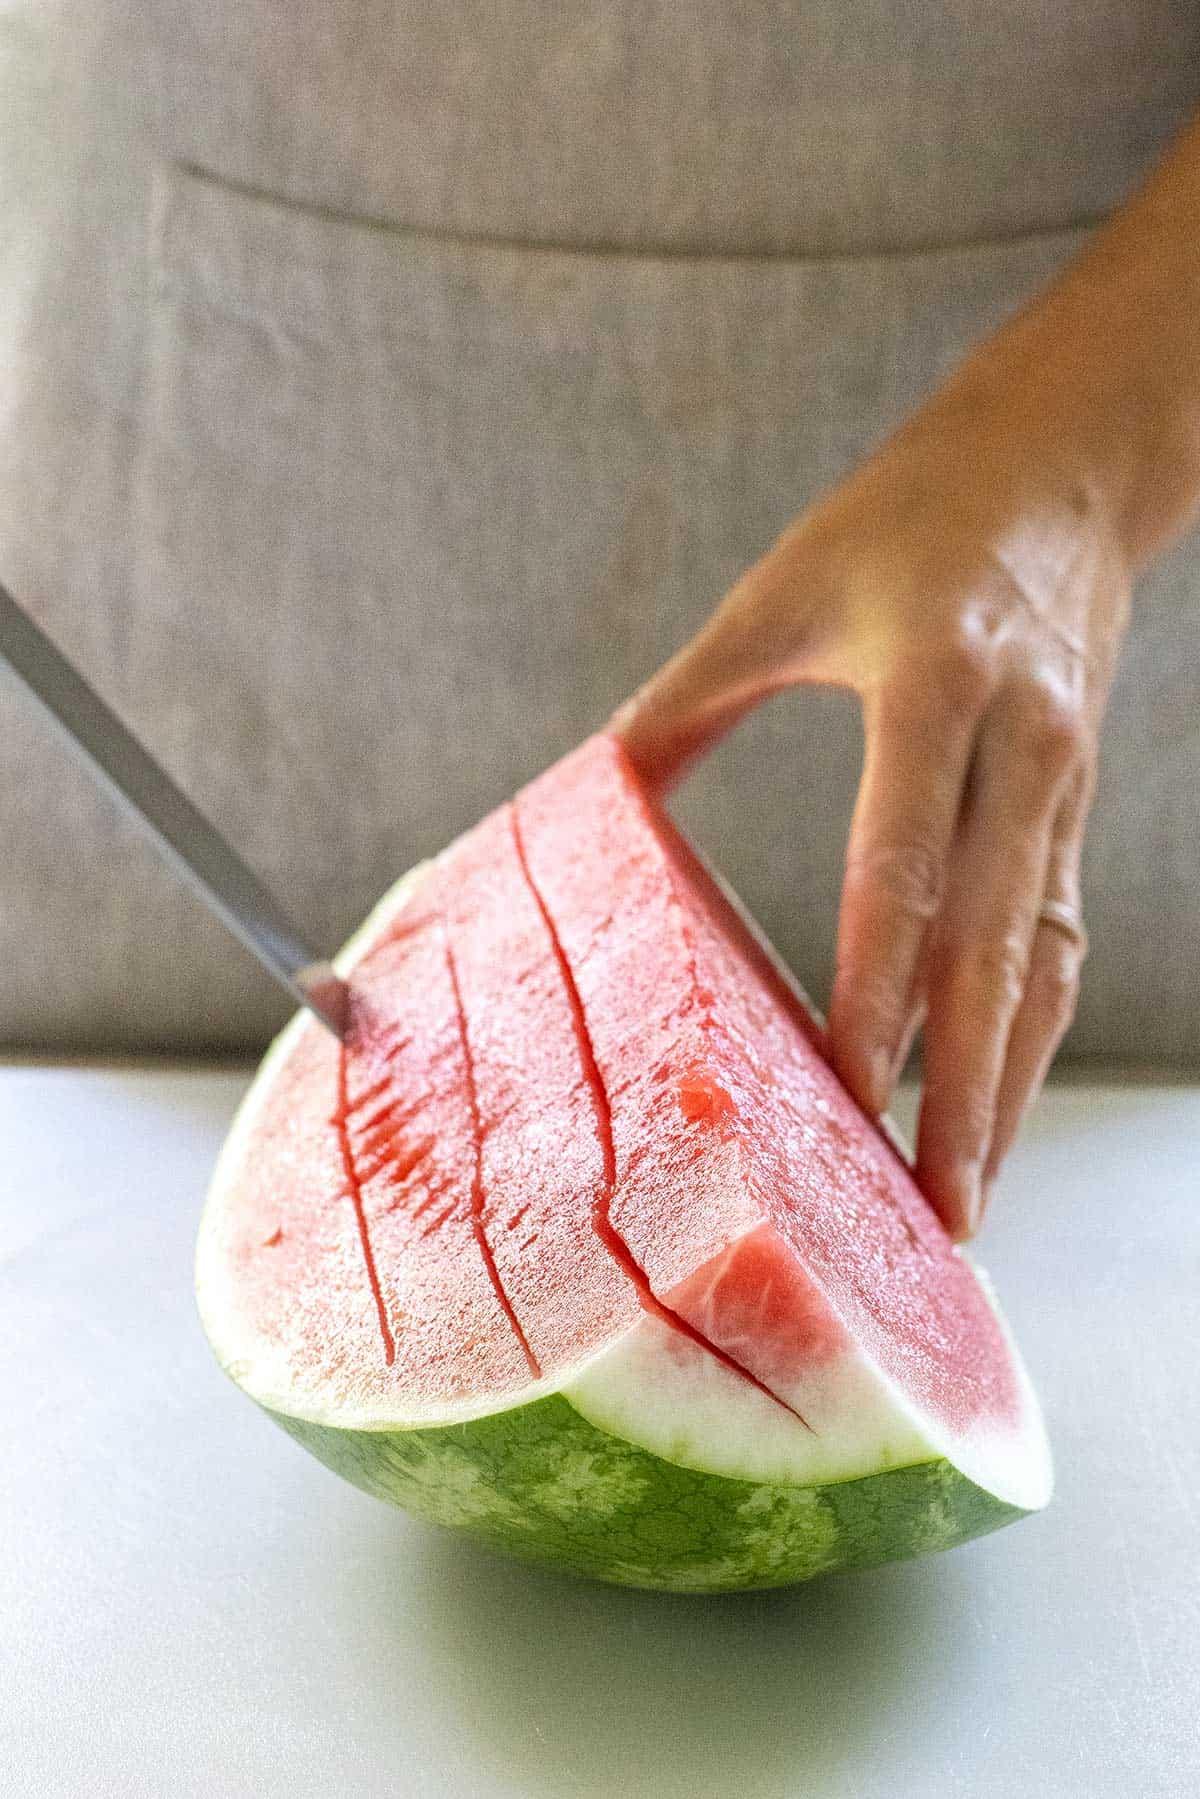 cutting into watermelon horizontally